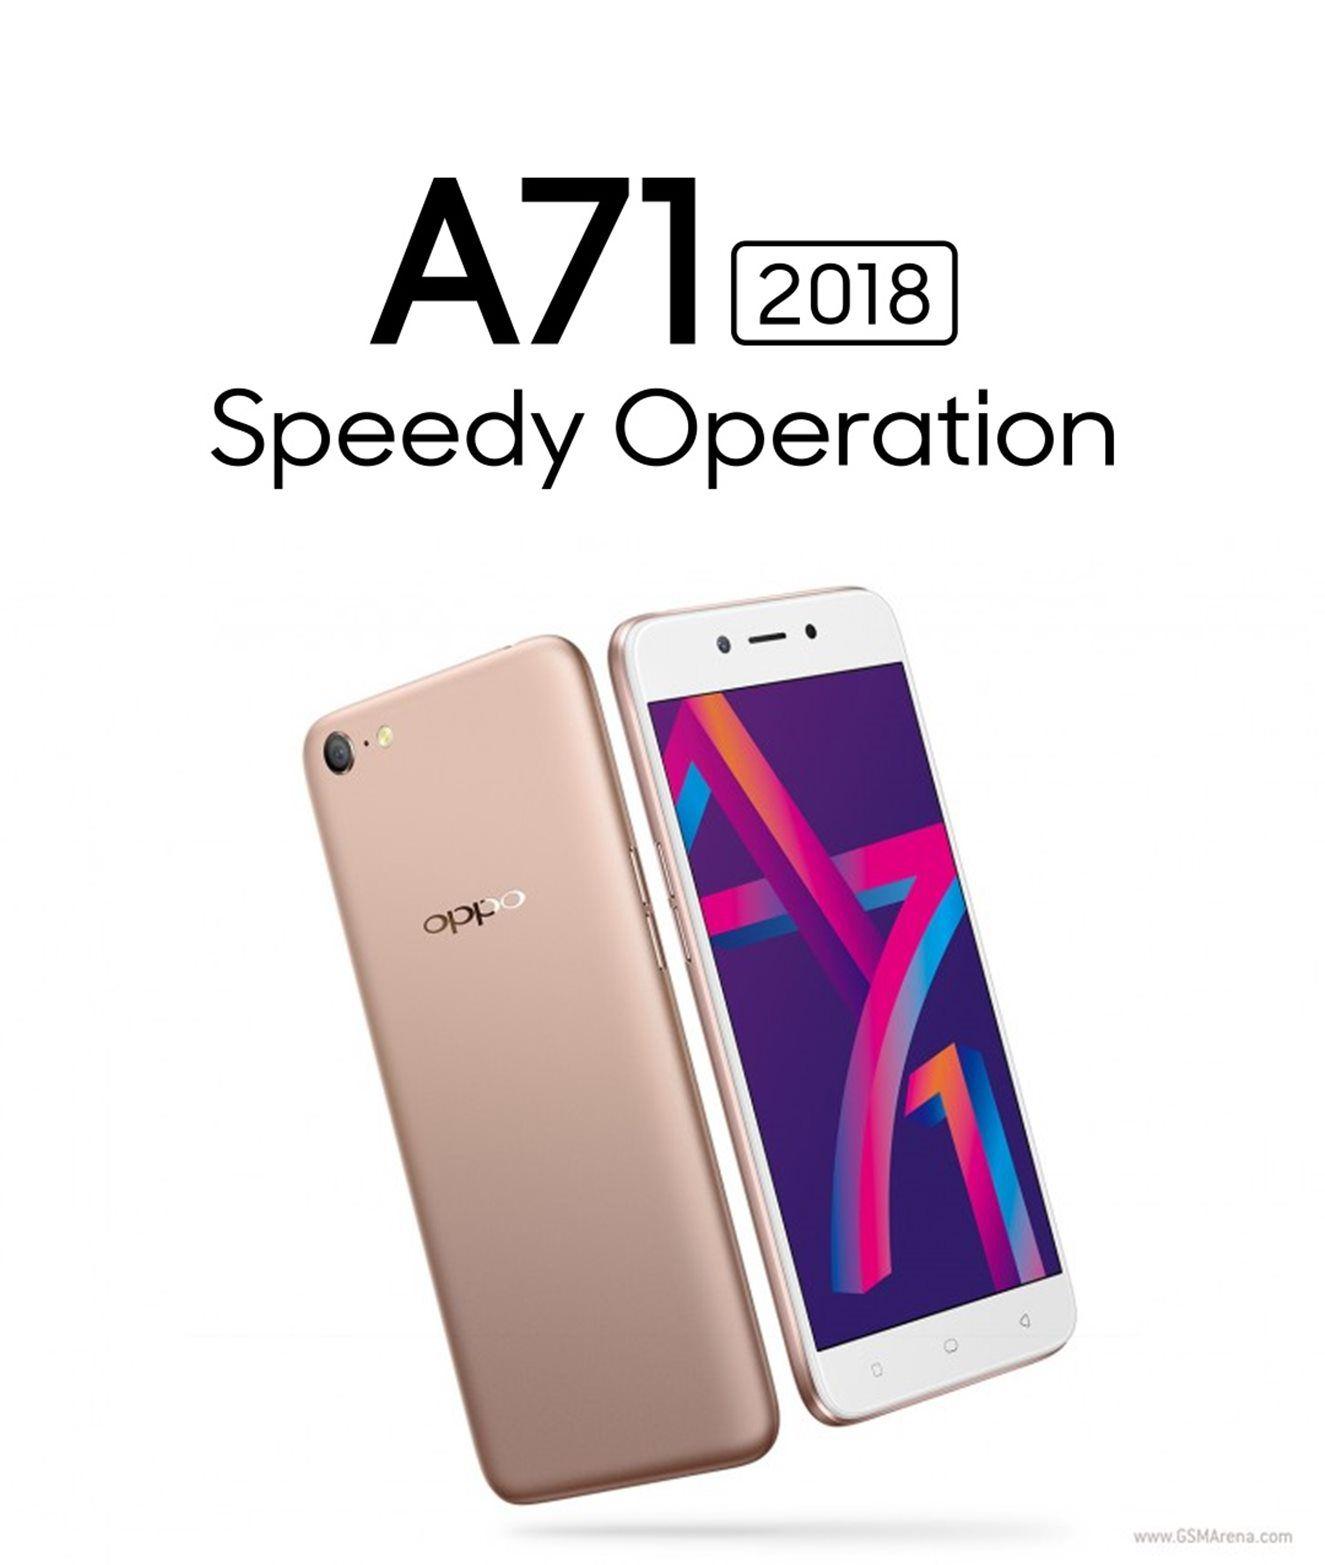 Oppo Gold A71 2018 model with speedy processor 3gb 16GB